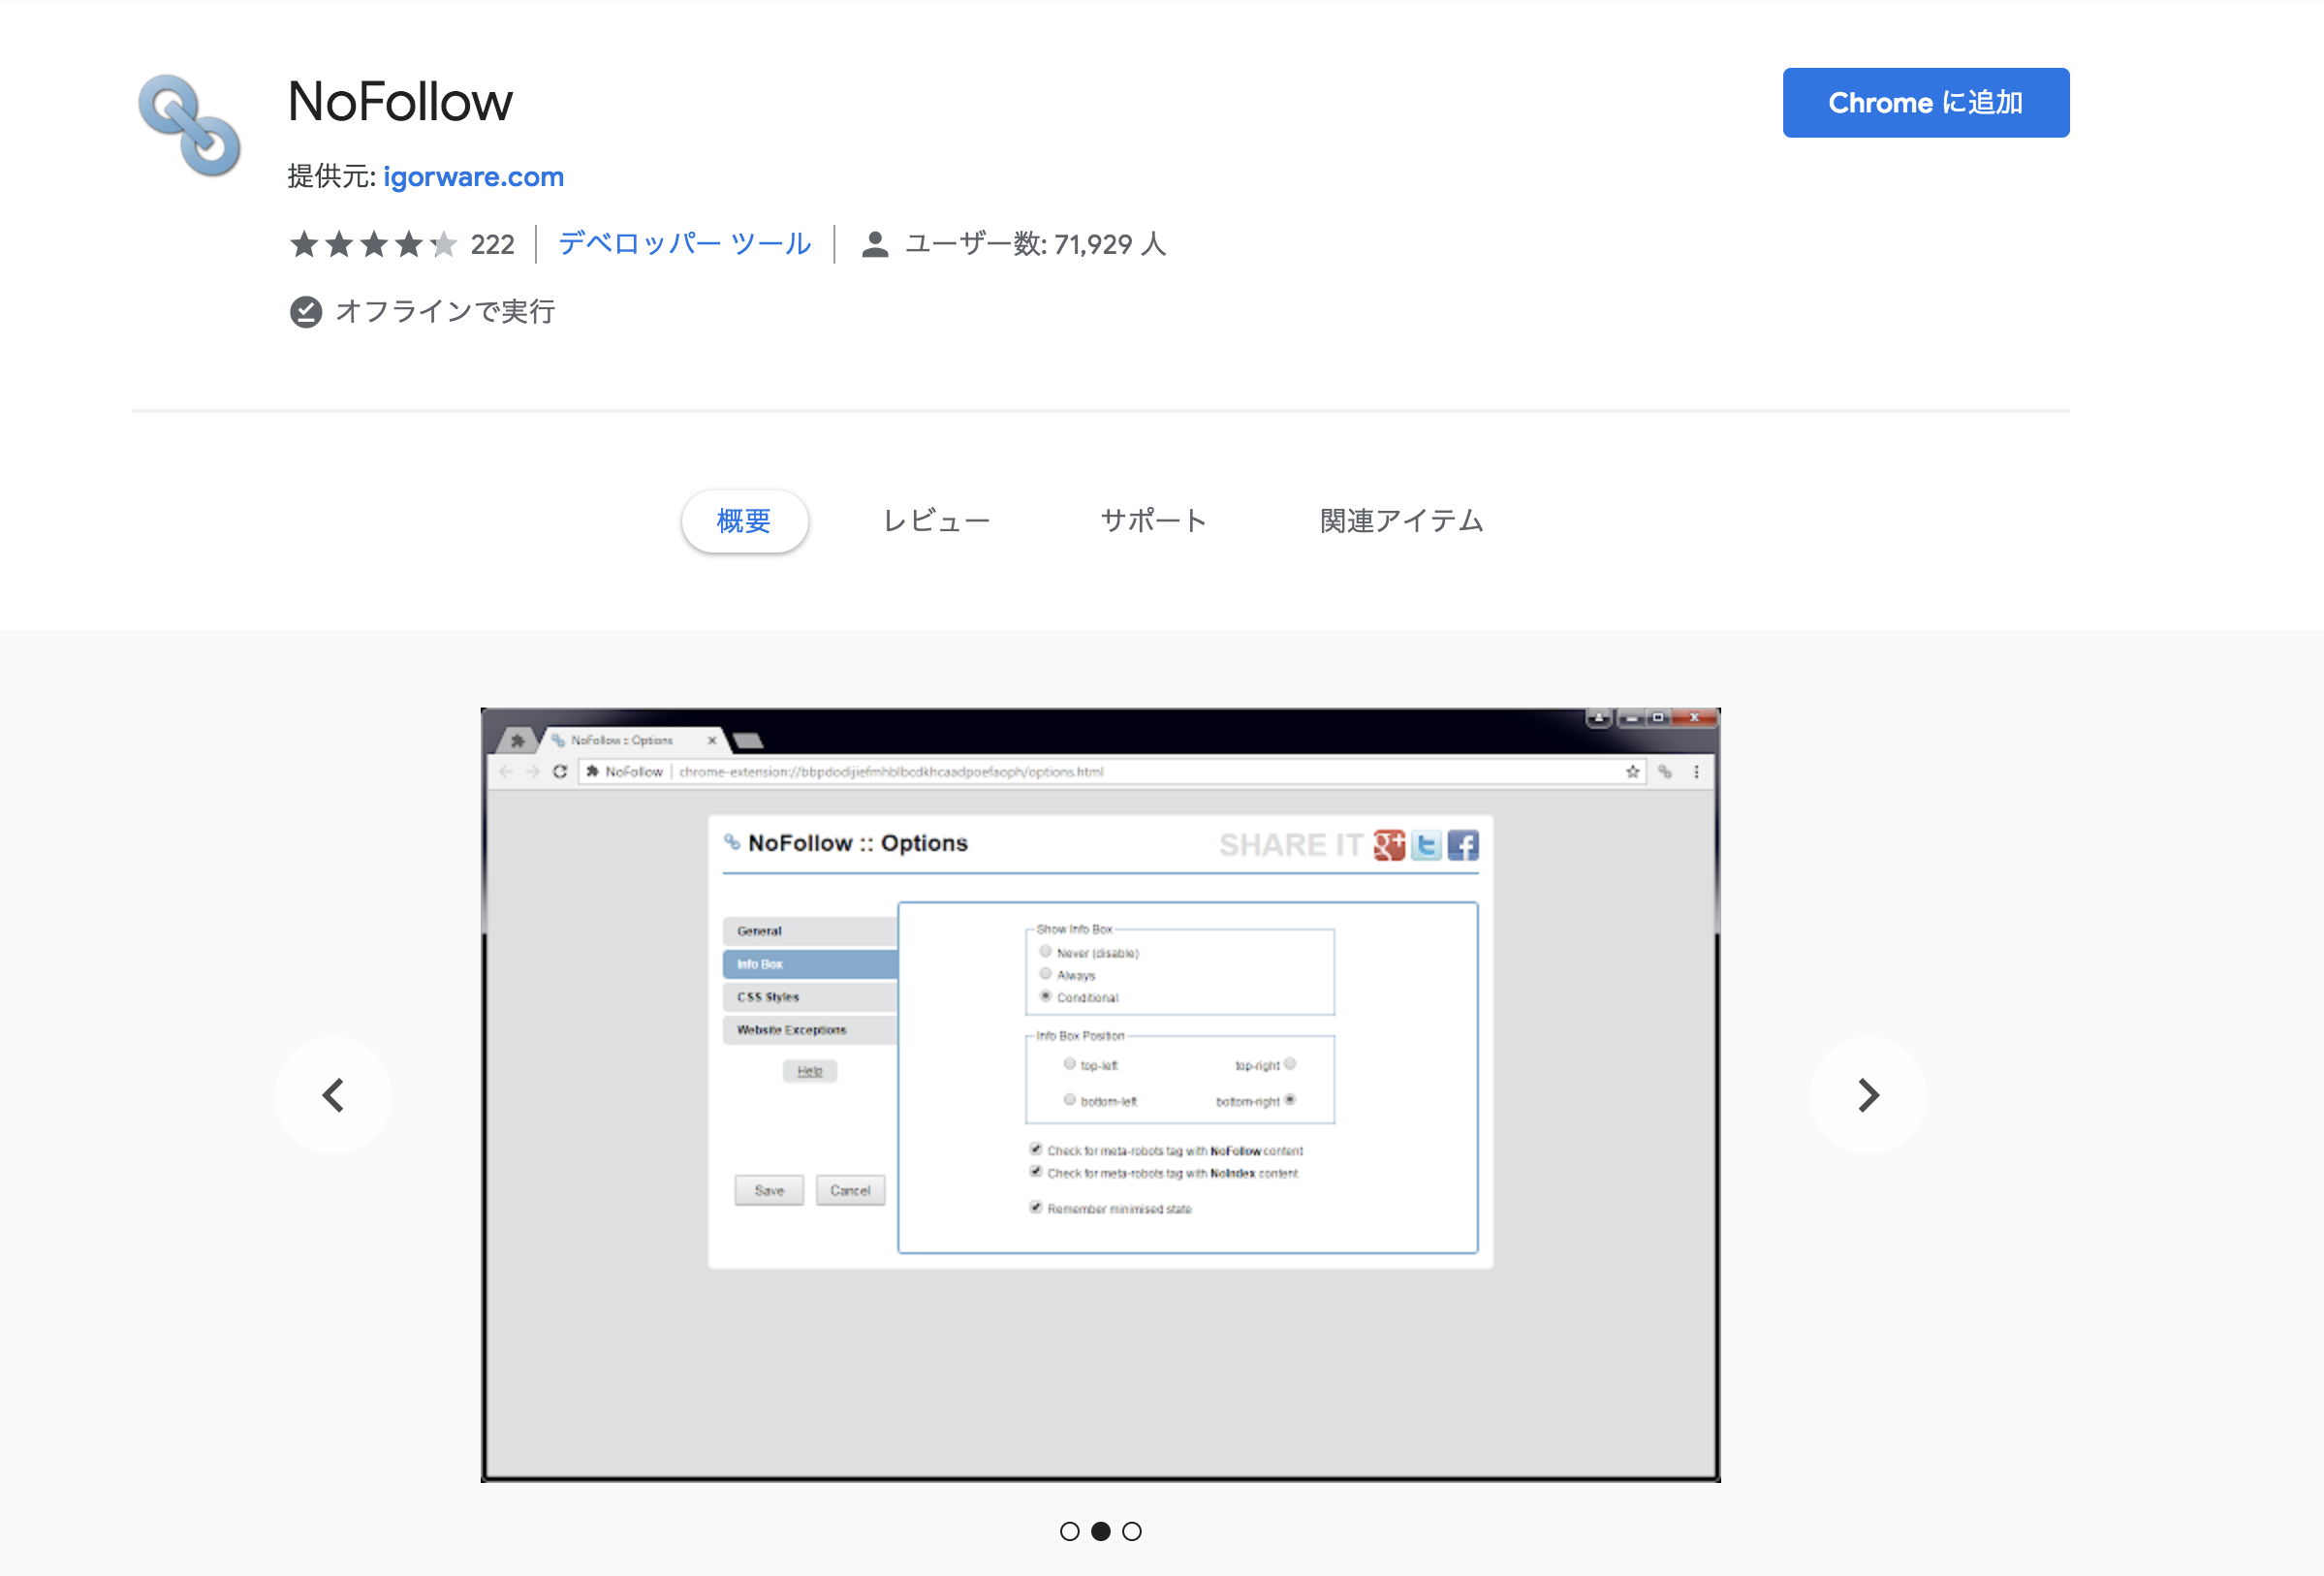 GoogleChrome(グーグルクローム) 拡張機能 NoFollow